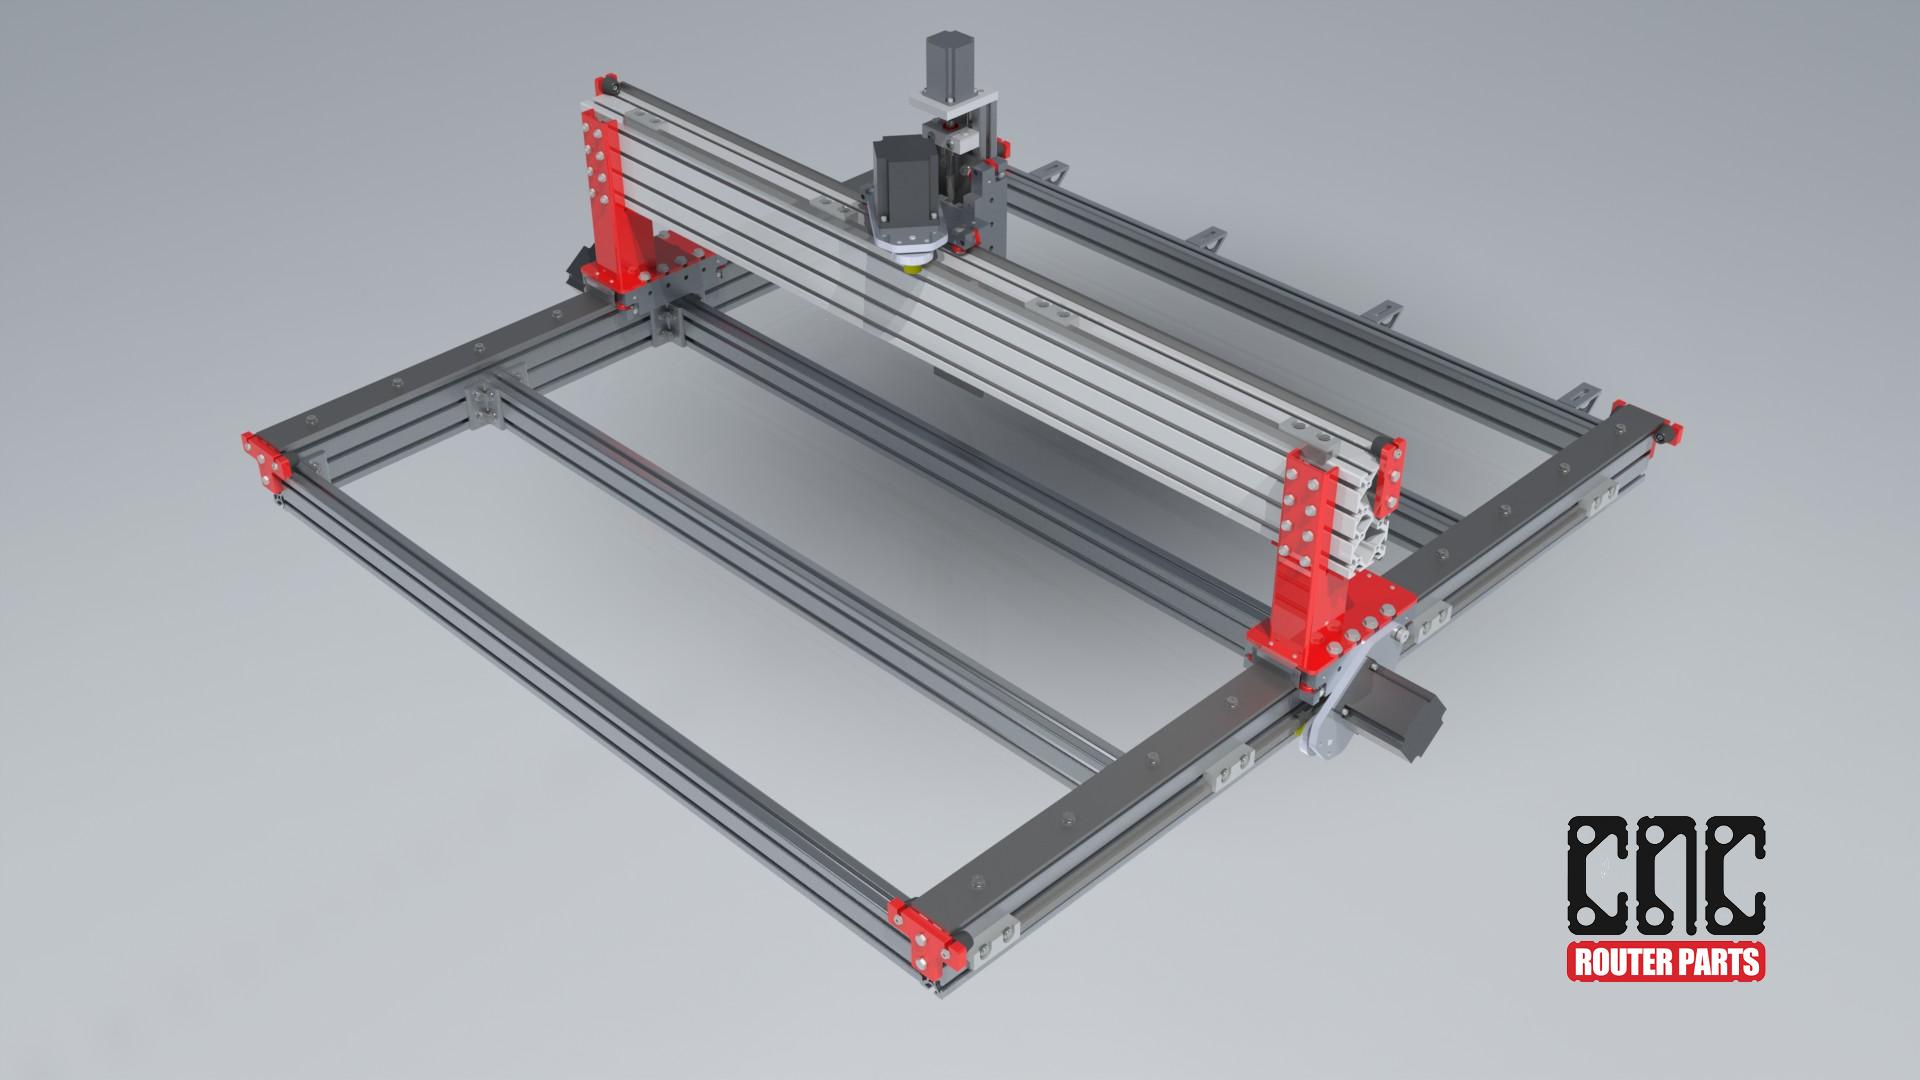 Woodworking cnc machine kits PDF Free Download